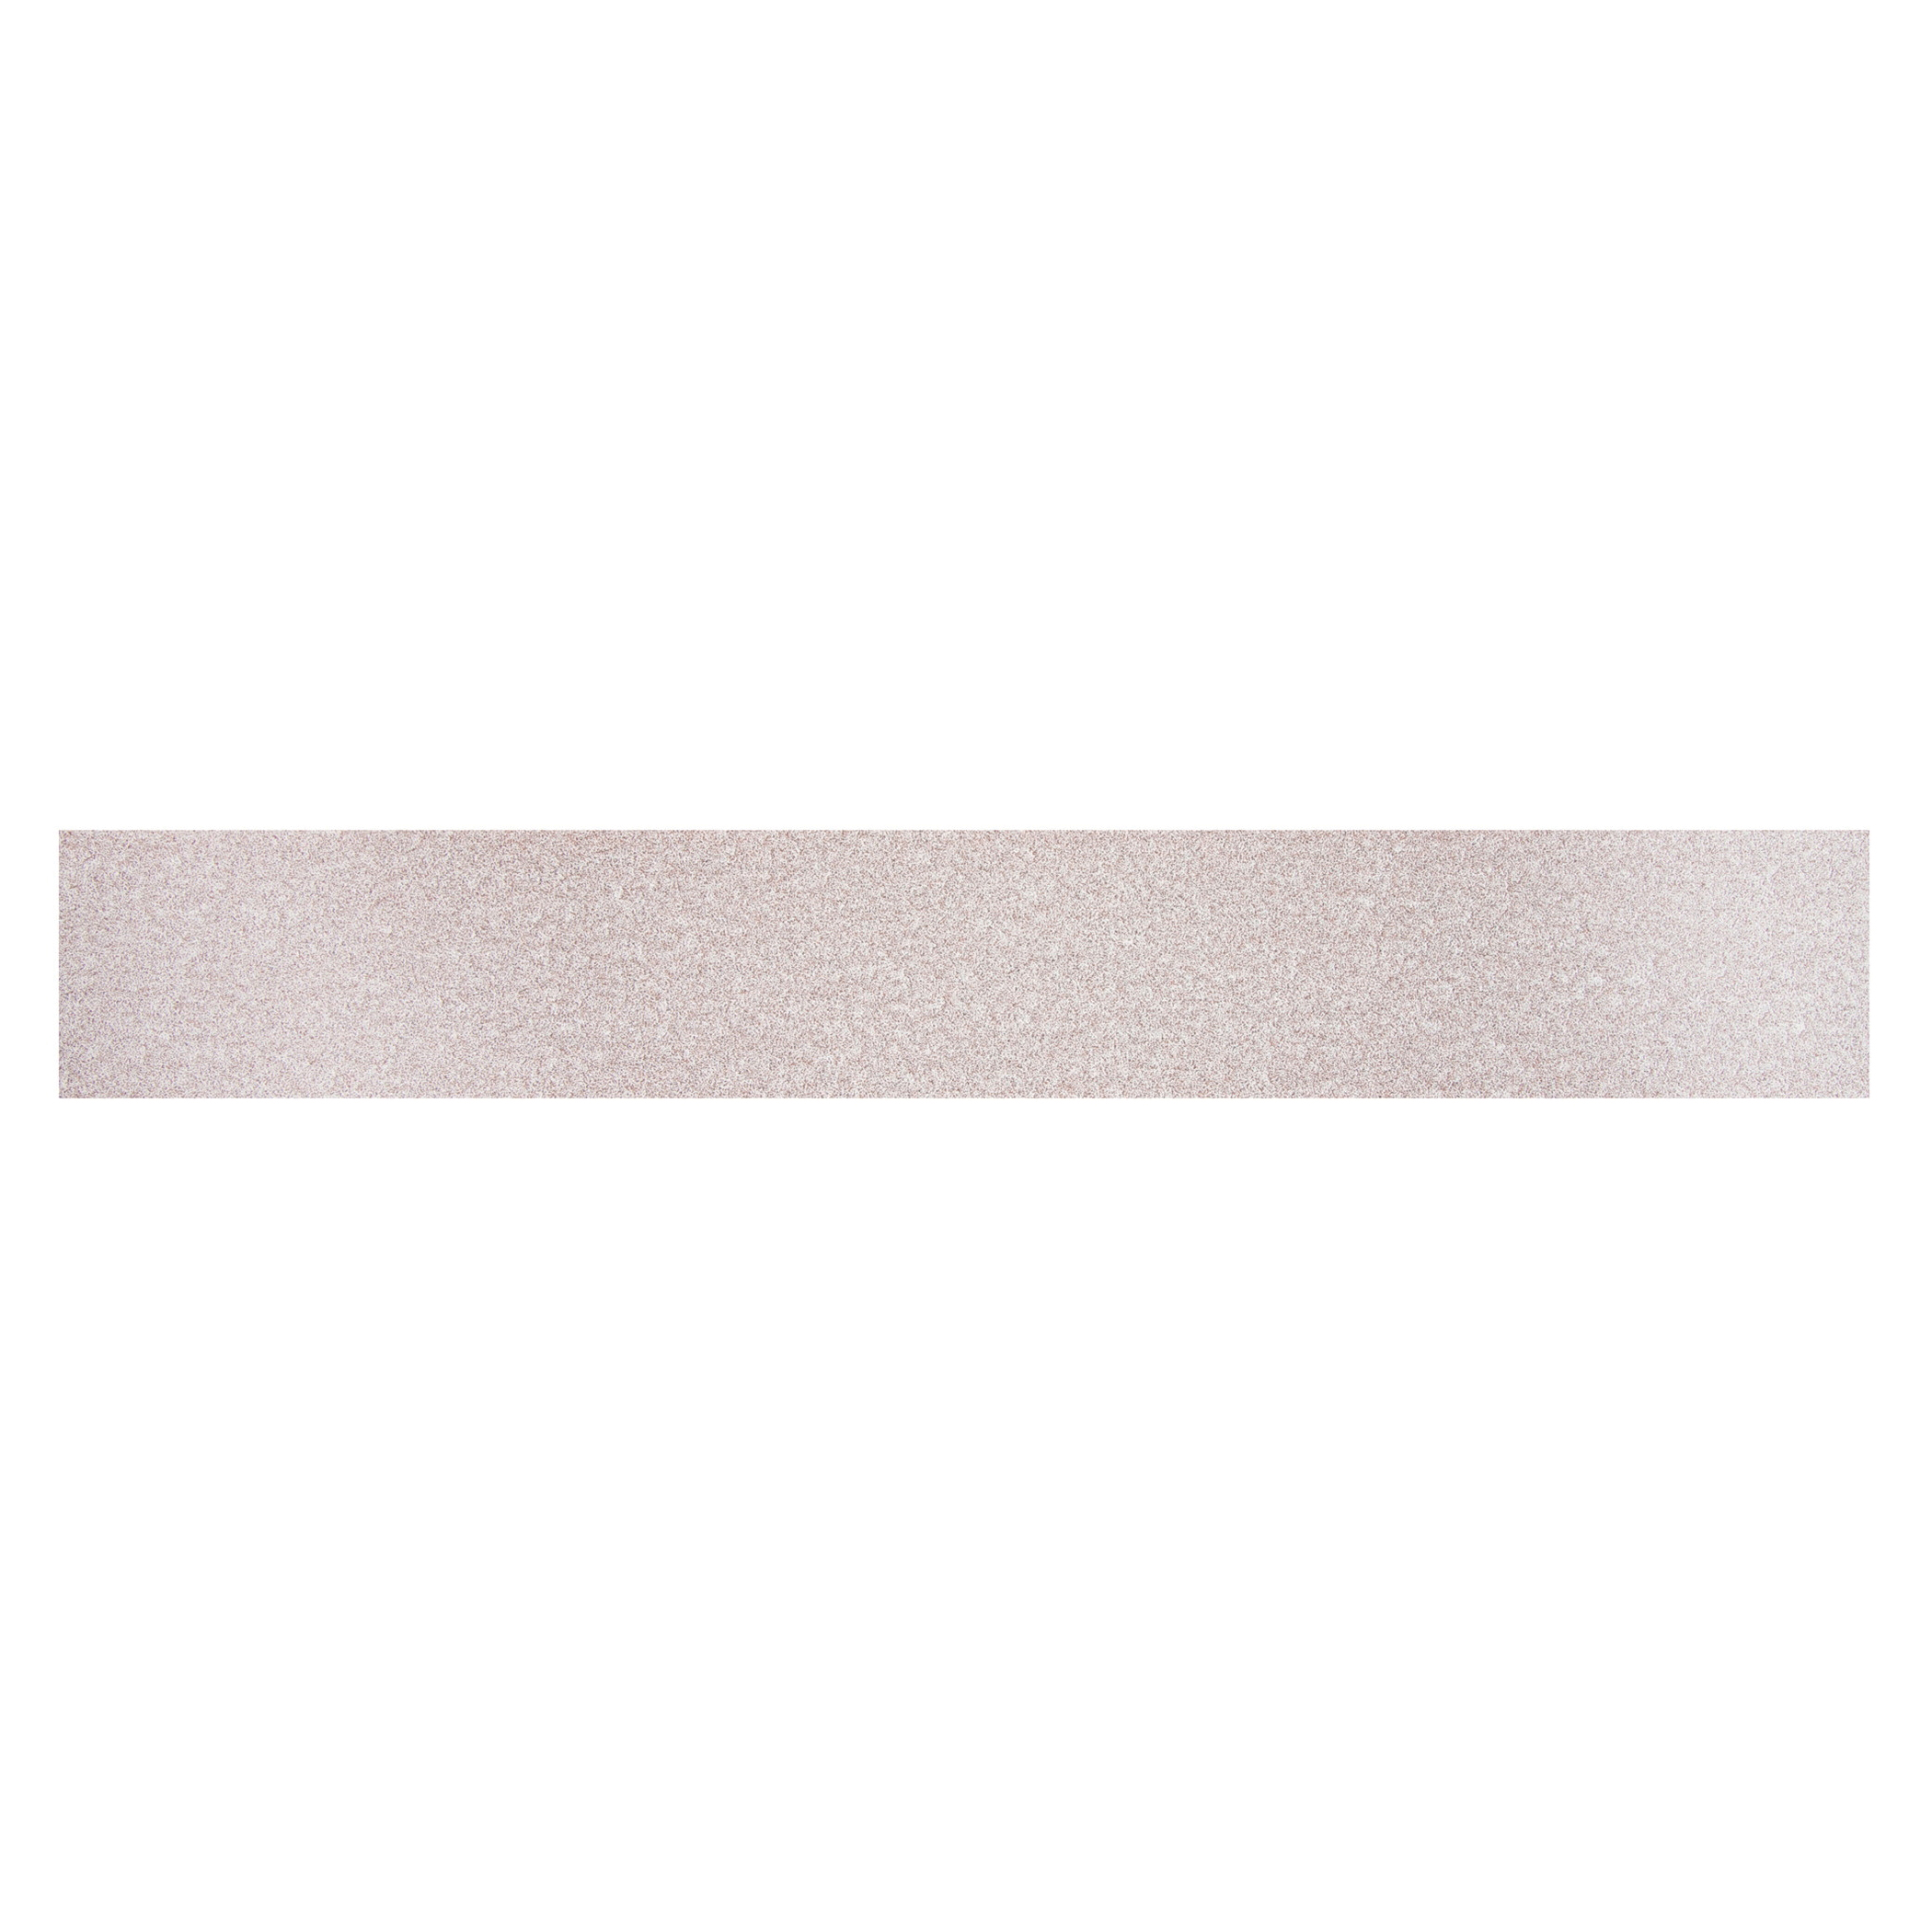 Norton® 66261131649 A275OP Non-PSA Coated File Strip, 17-1/2 in L x 2-3/4 in W, P150 Grit, Fine Grade, Aluminum Oxide Abrasive, Anti-Loading Paper Backing